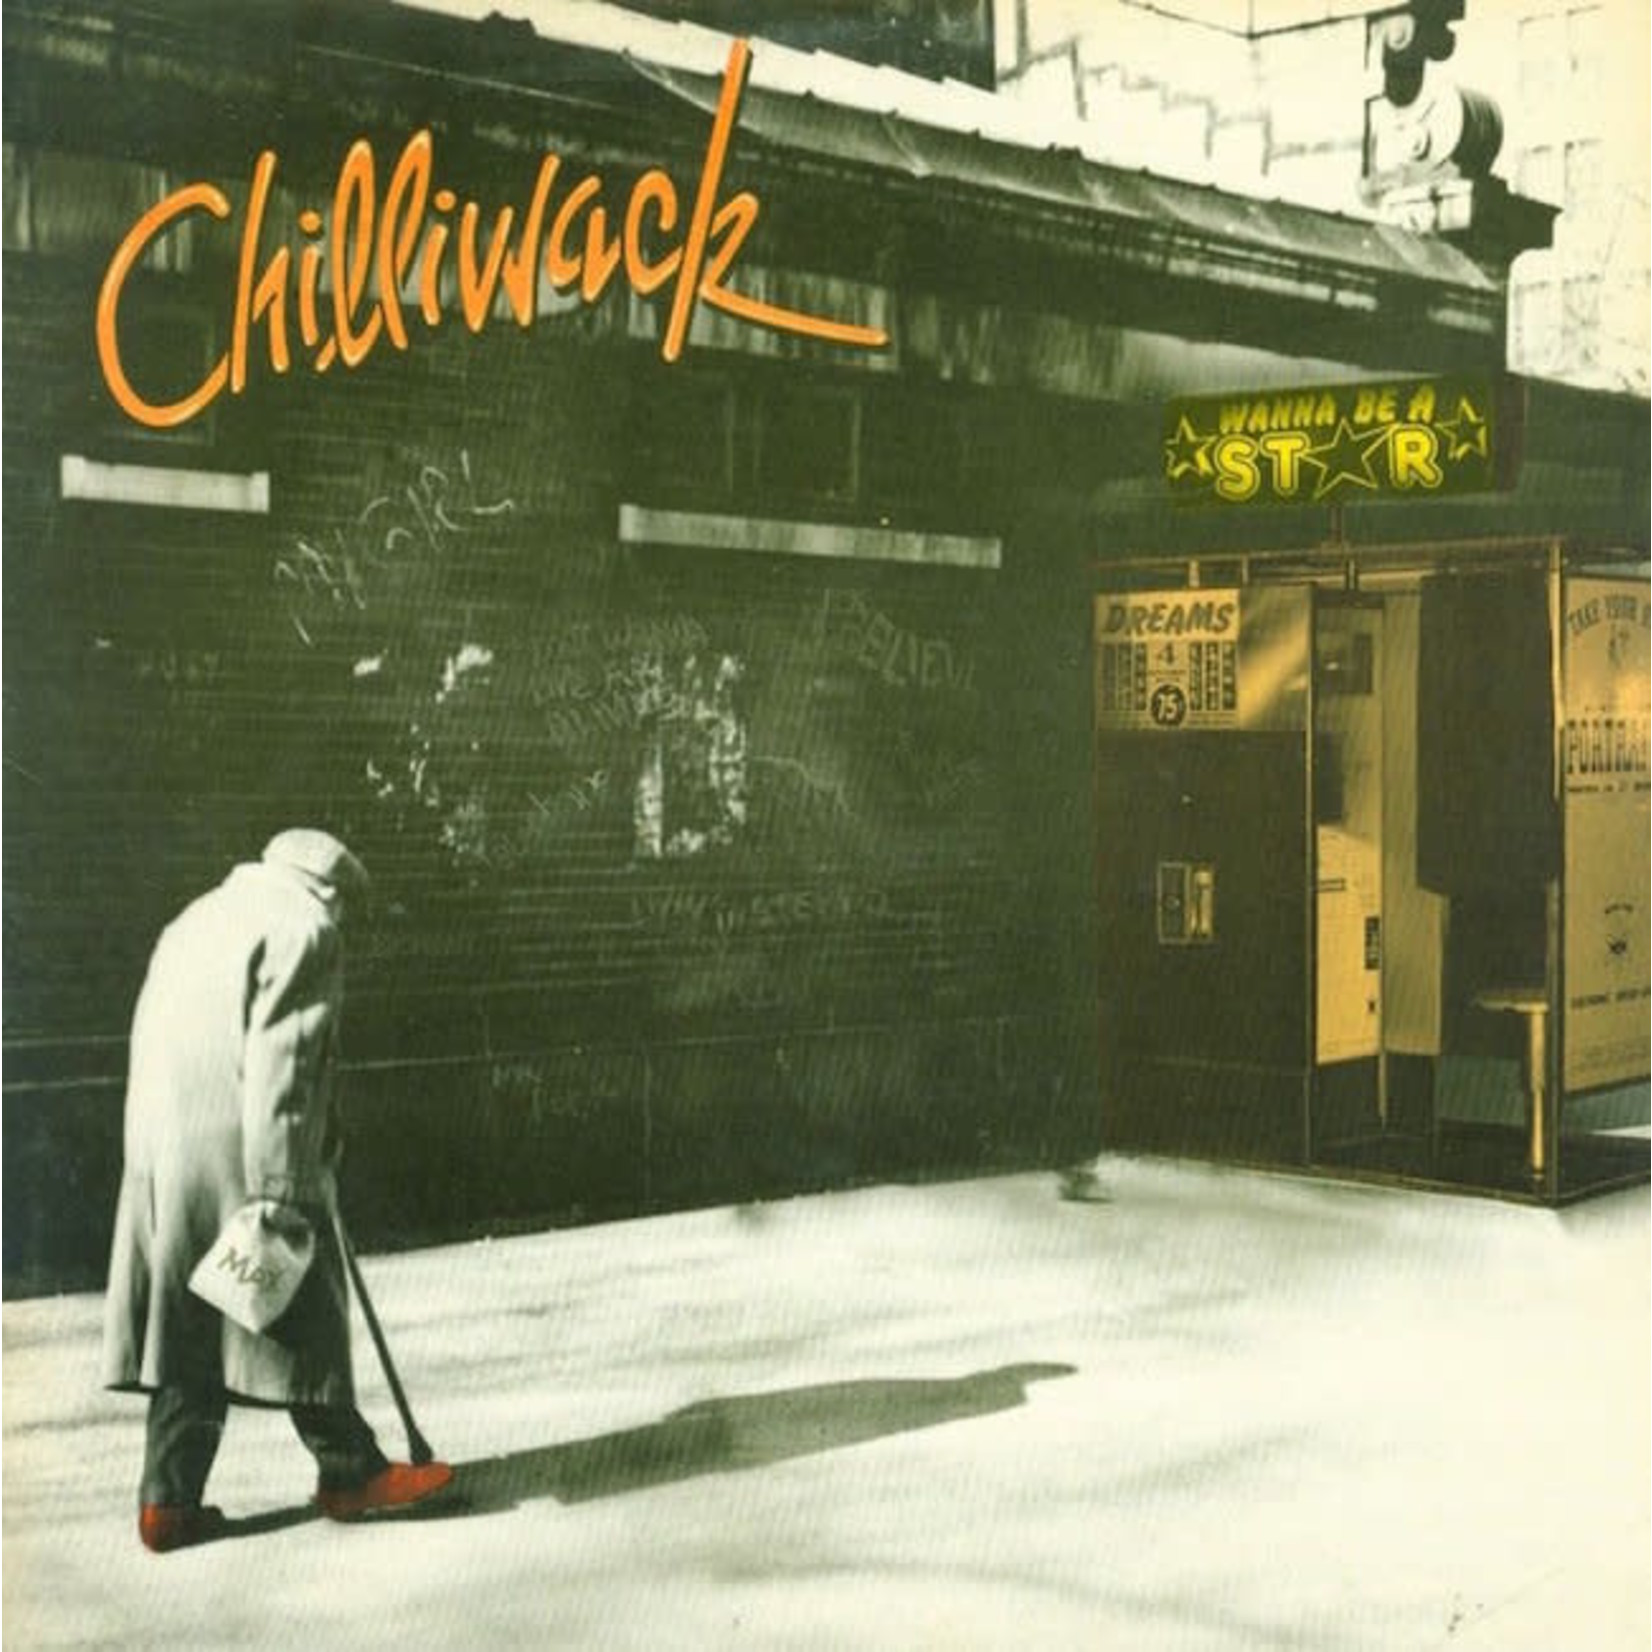 [Vintage] Chilliwack: Wanna Be a Star